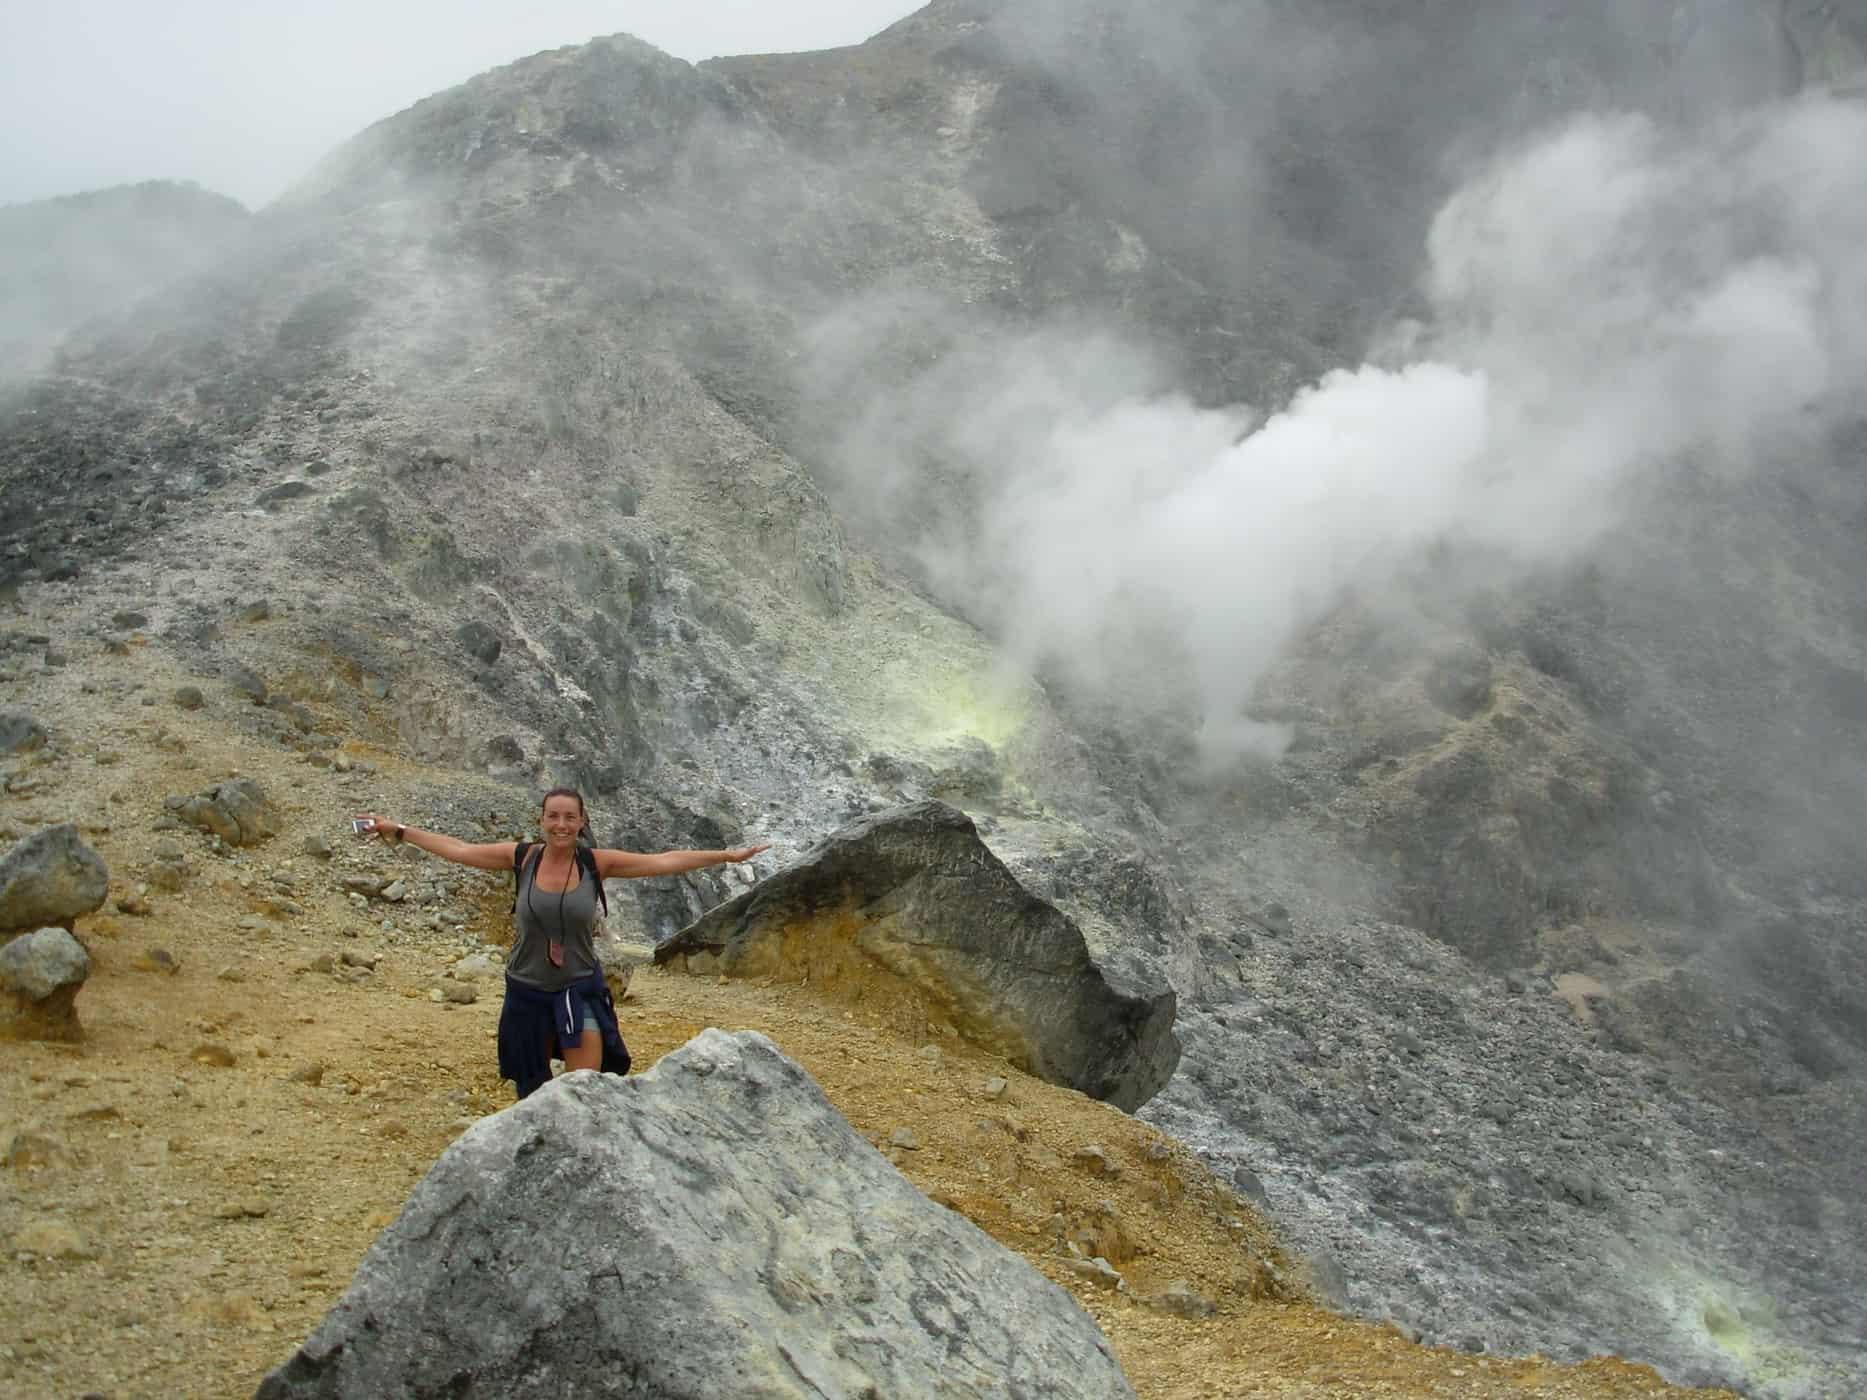 At the crater of Gunung Sibayak Berestagi, Sumatra.